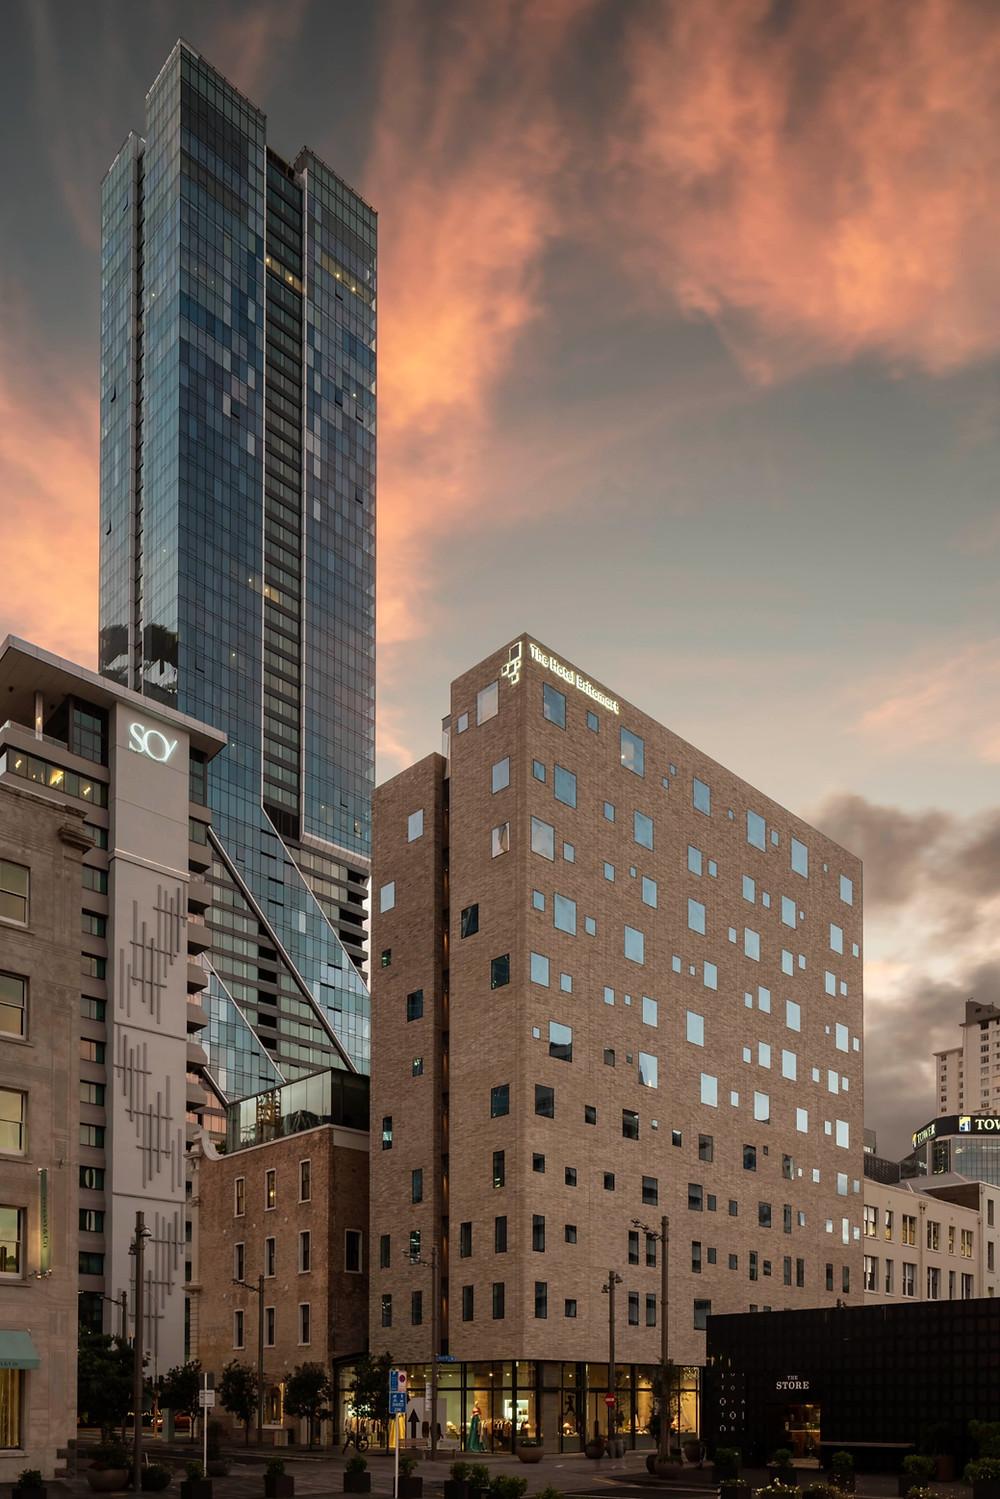 Brick Inlay has created a spectacular full brick facade for The Hotel Britomart